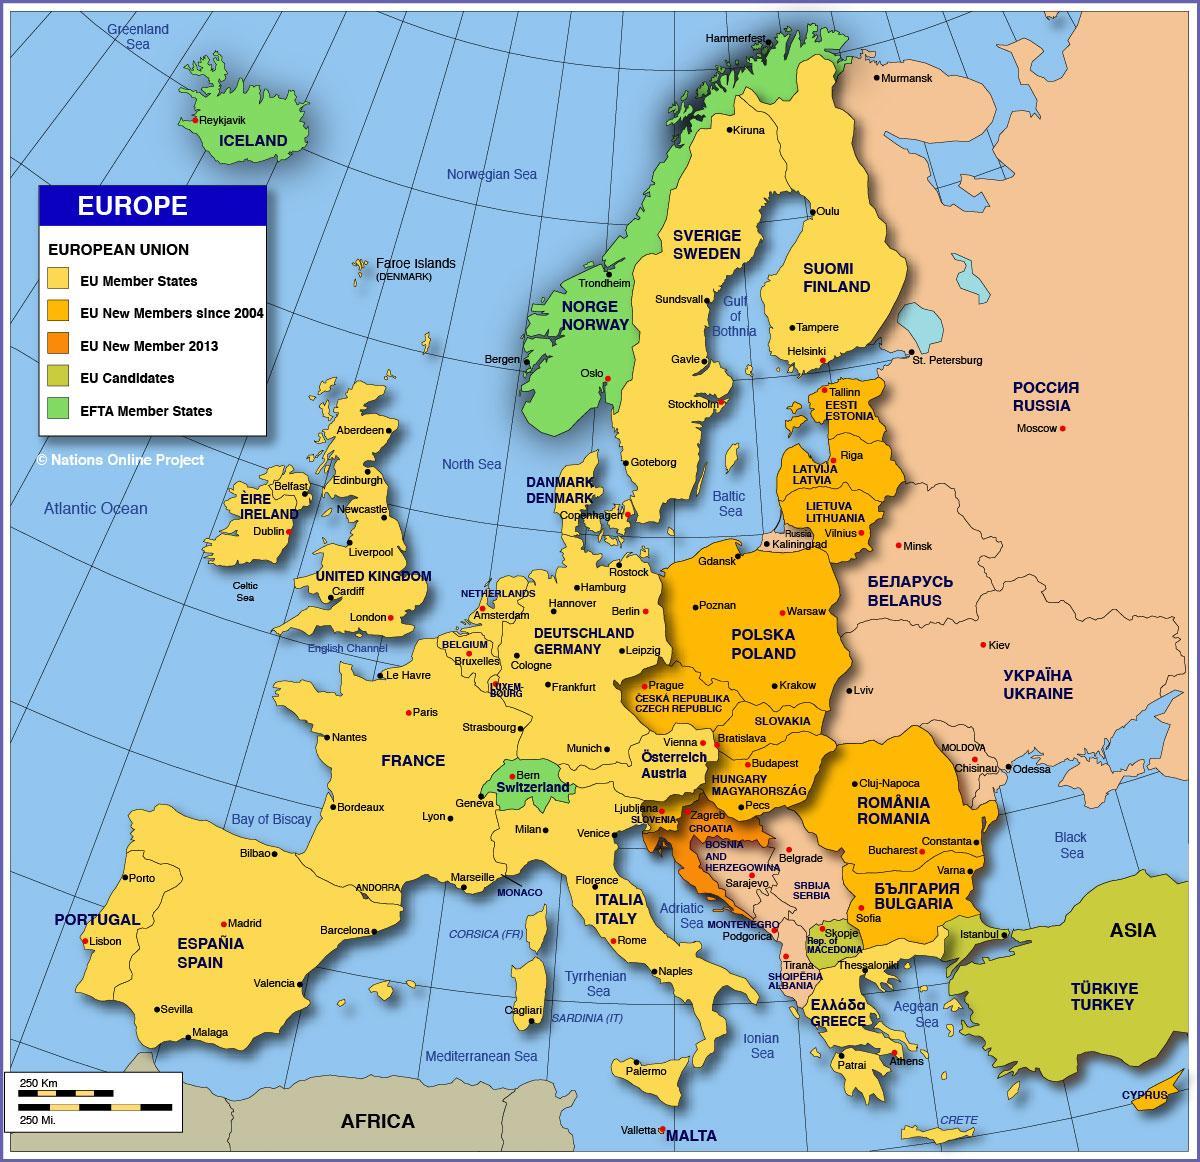 Rusiji Karta Evrope Karta Rusija Europa Istocna Europa Europa